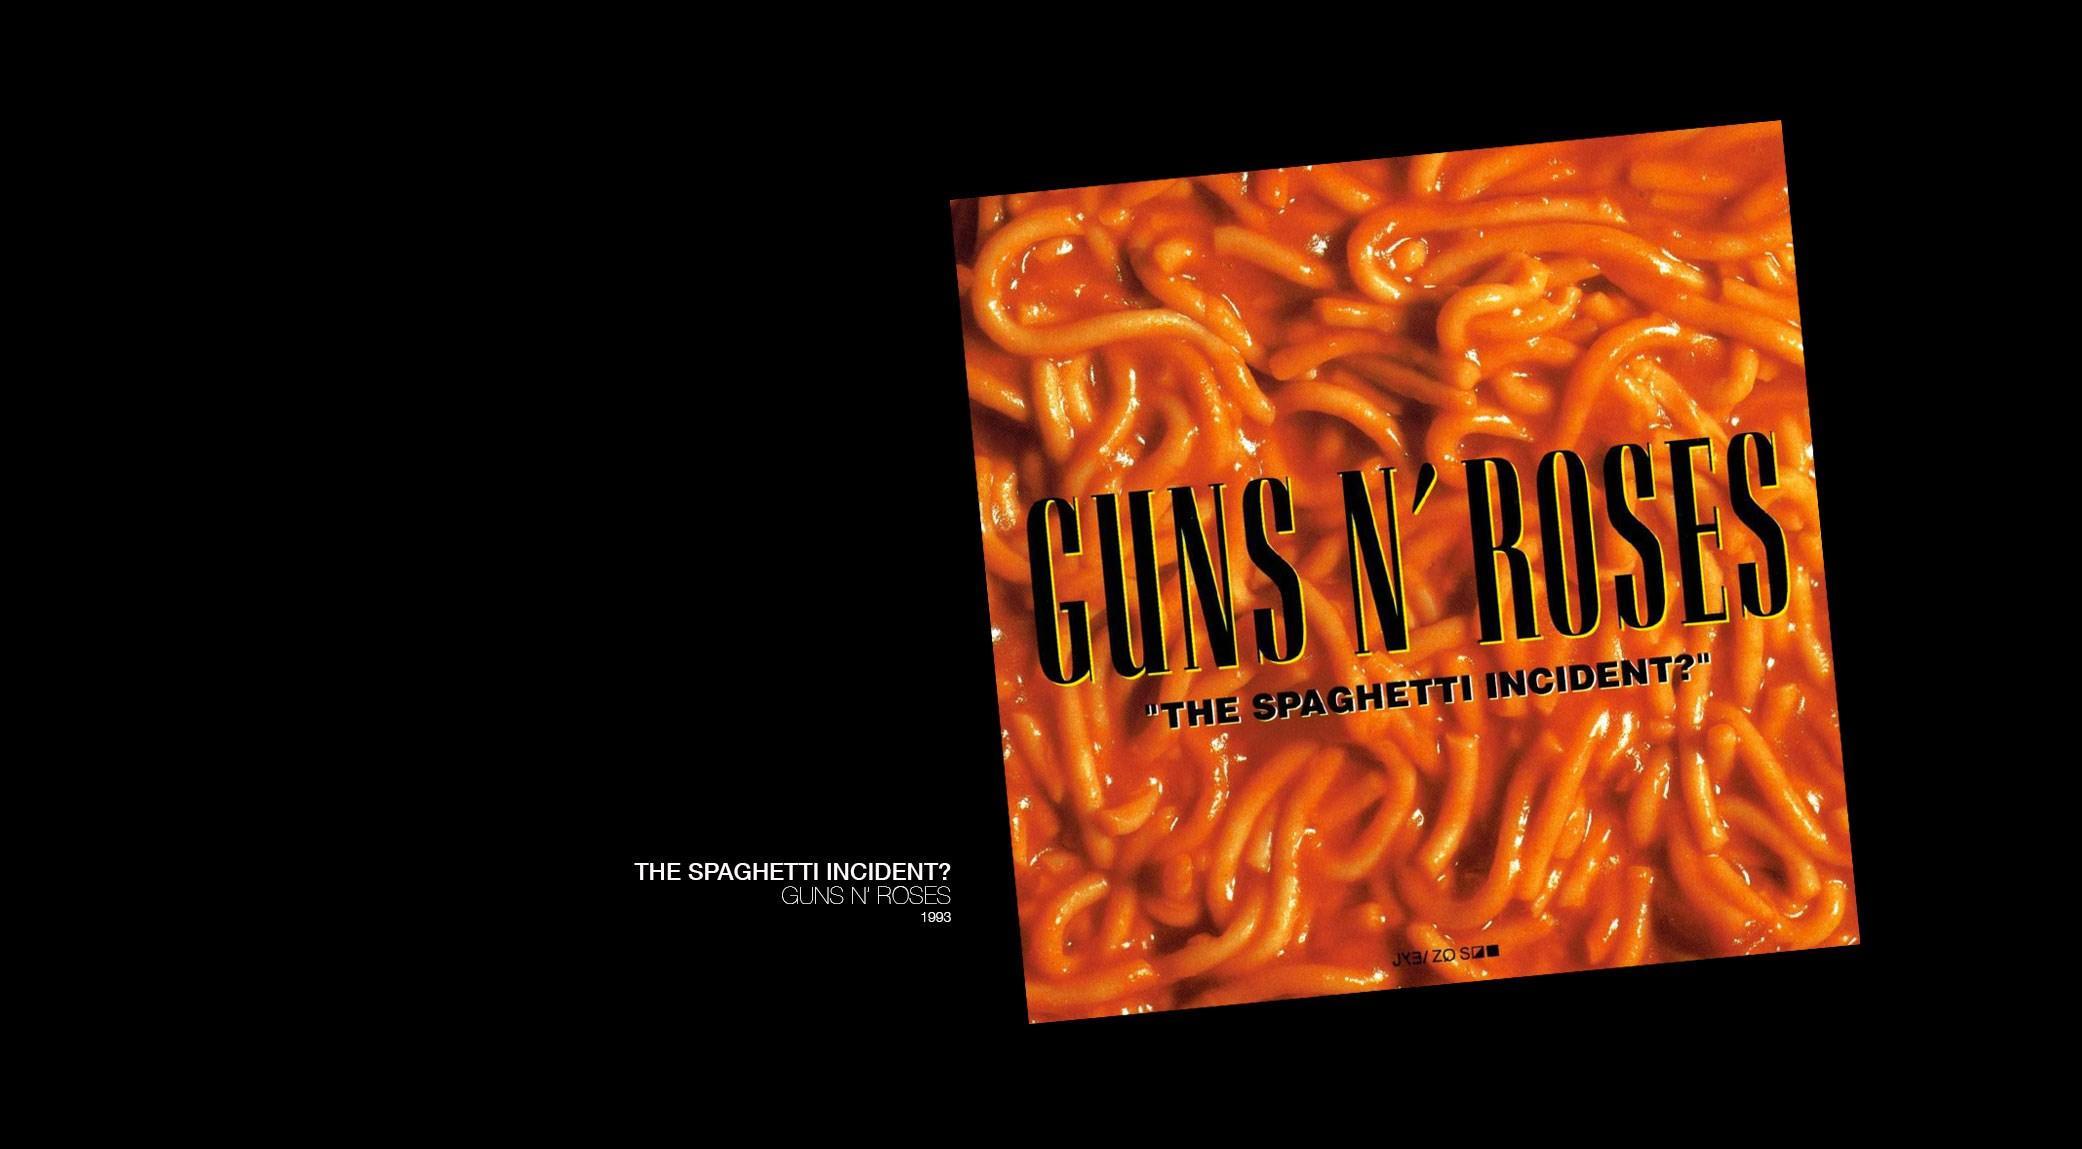 The Spaghetti Incident? Guns N'Roses